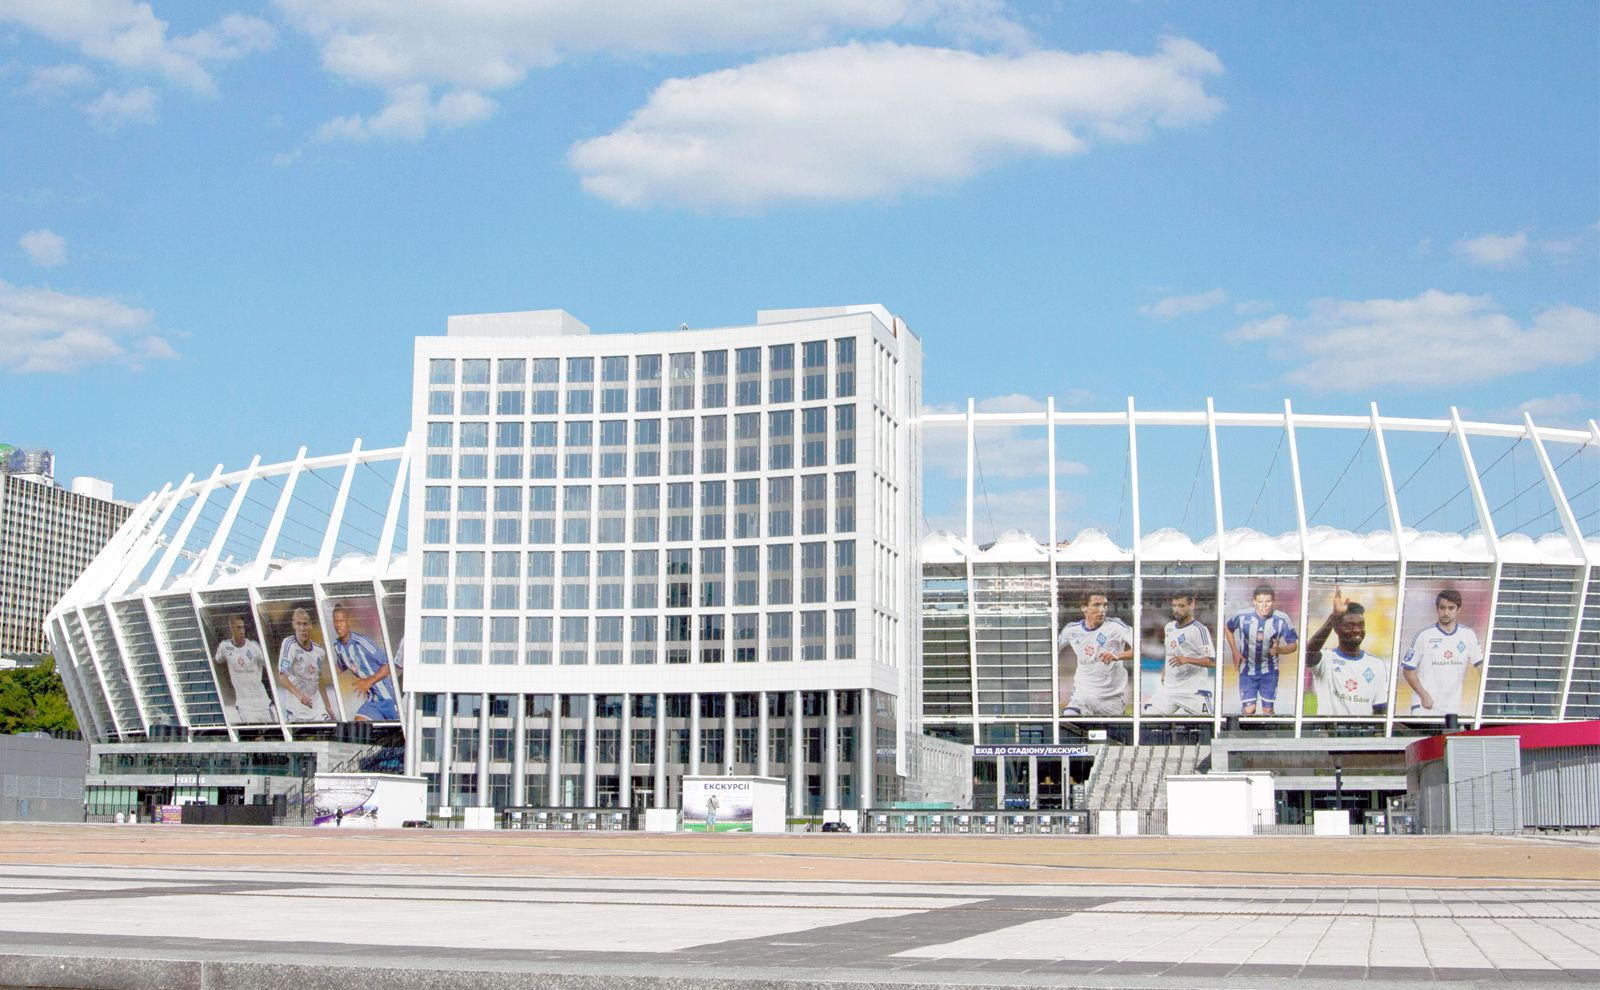 Gira Referenz Kiew Fußballstadion